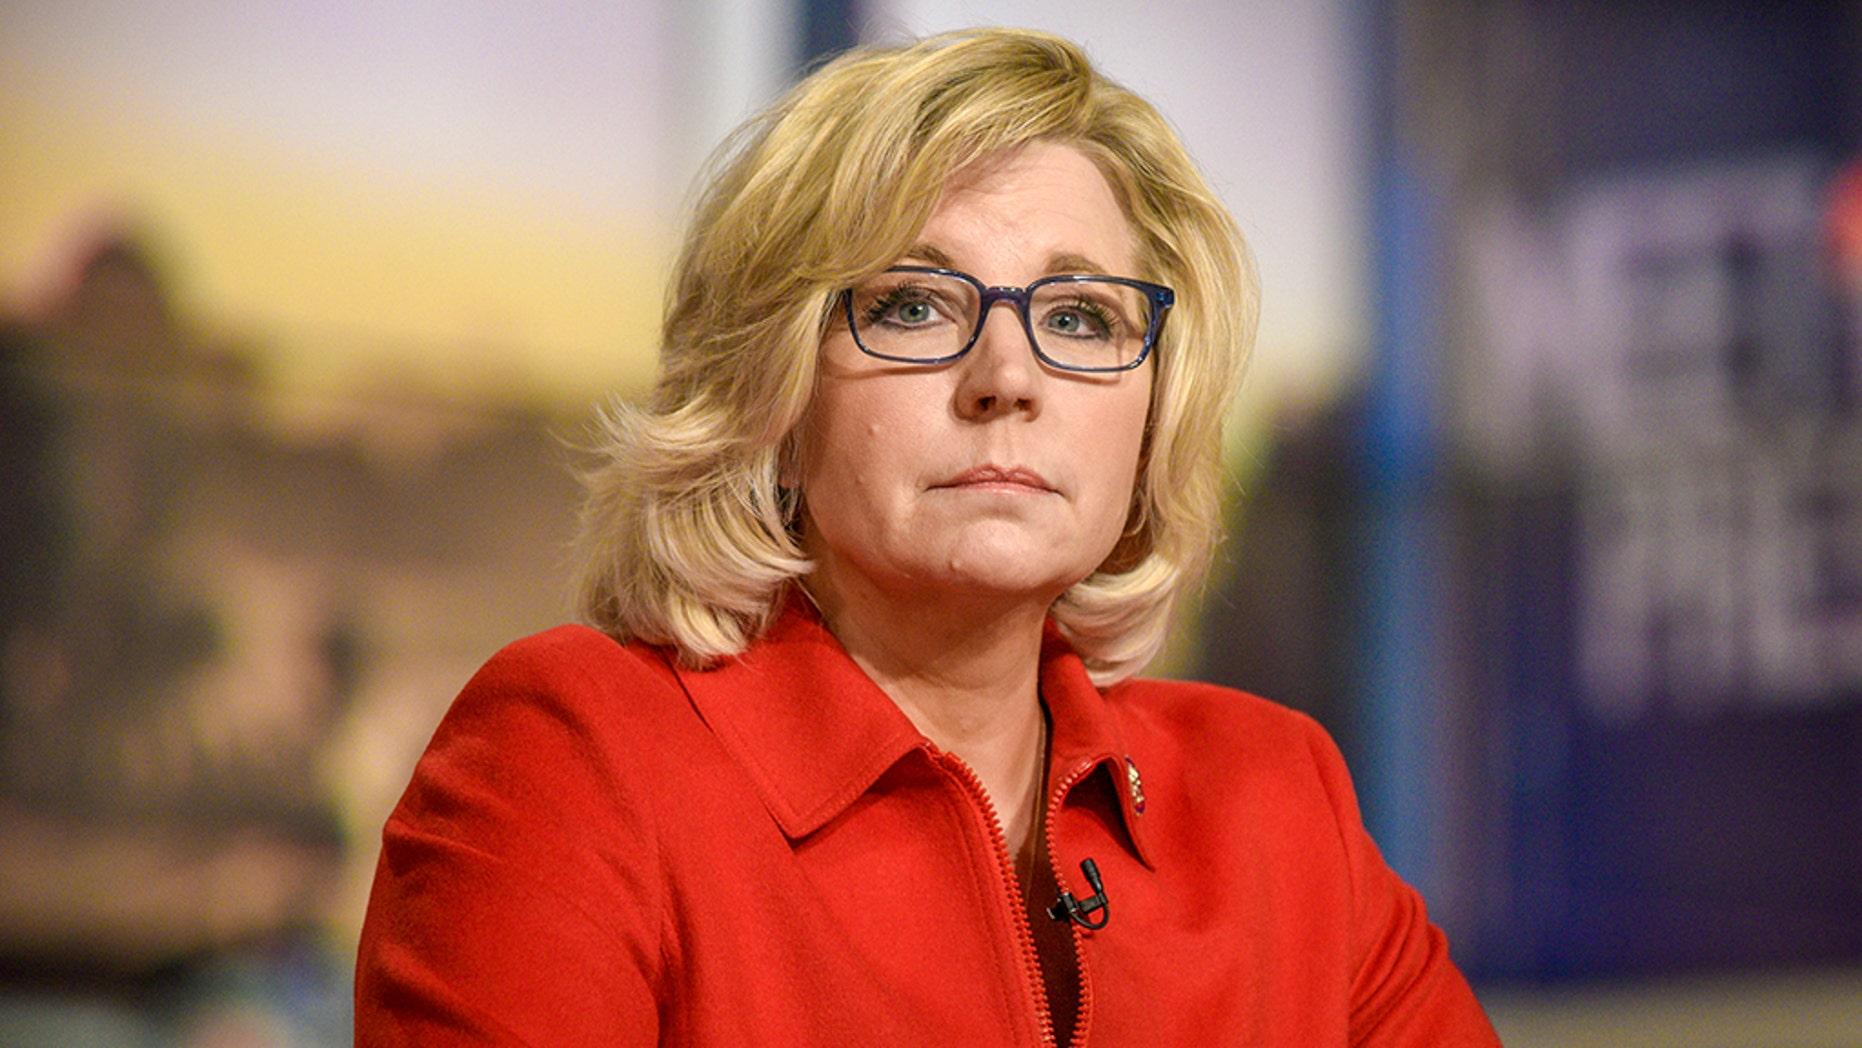 Rep. Liz Cheney, R-Wyo., said Tuesday she will vote to impeach President Trump. (William B. Plowman/NBC/NBC NewsWire via Getty Images)